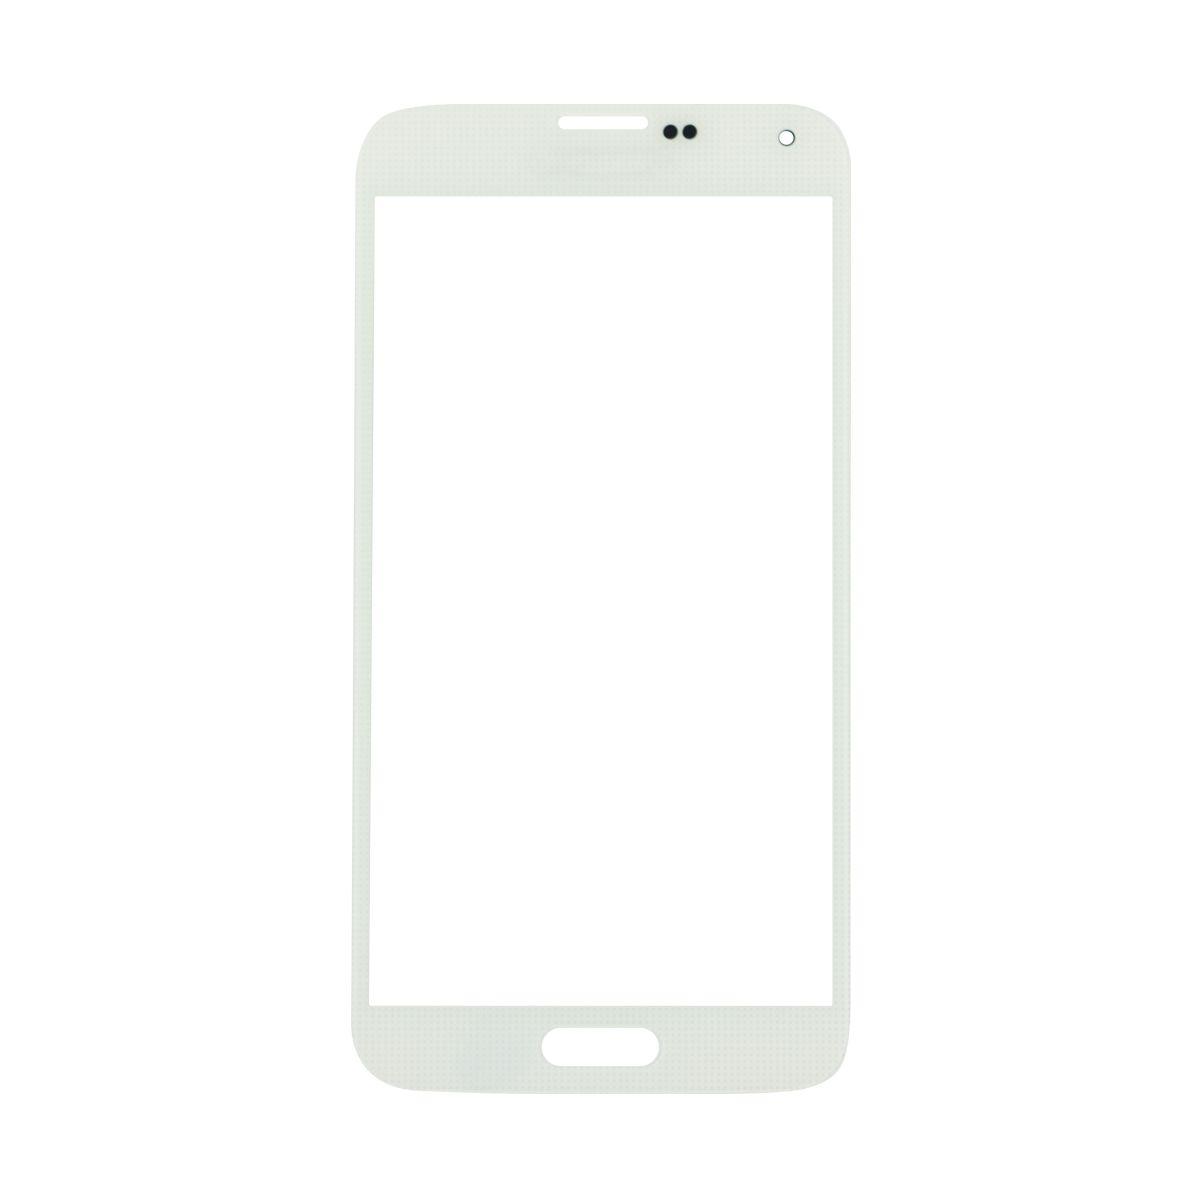 Samsung Galaxy S5 Glass Lens Screen Repl #76088.